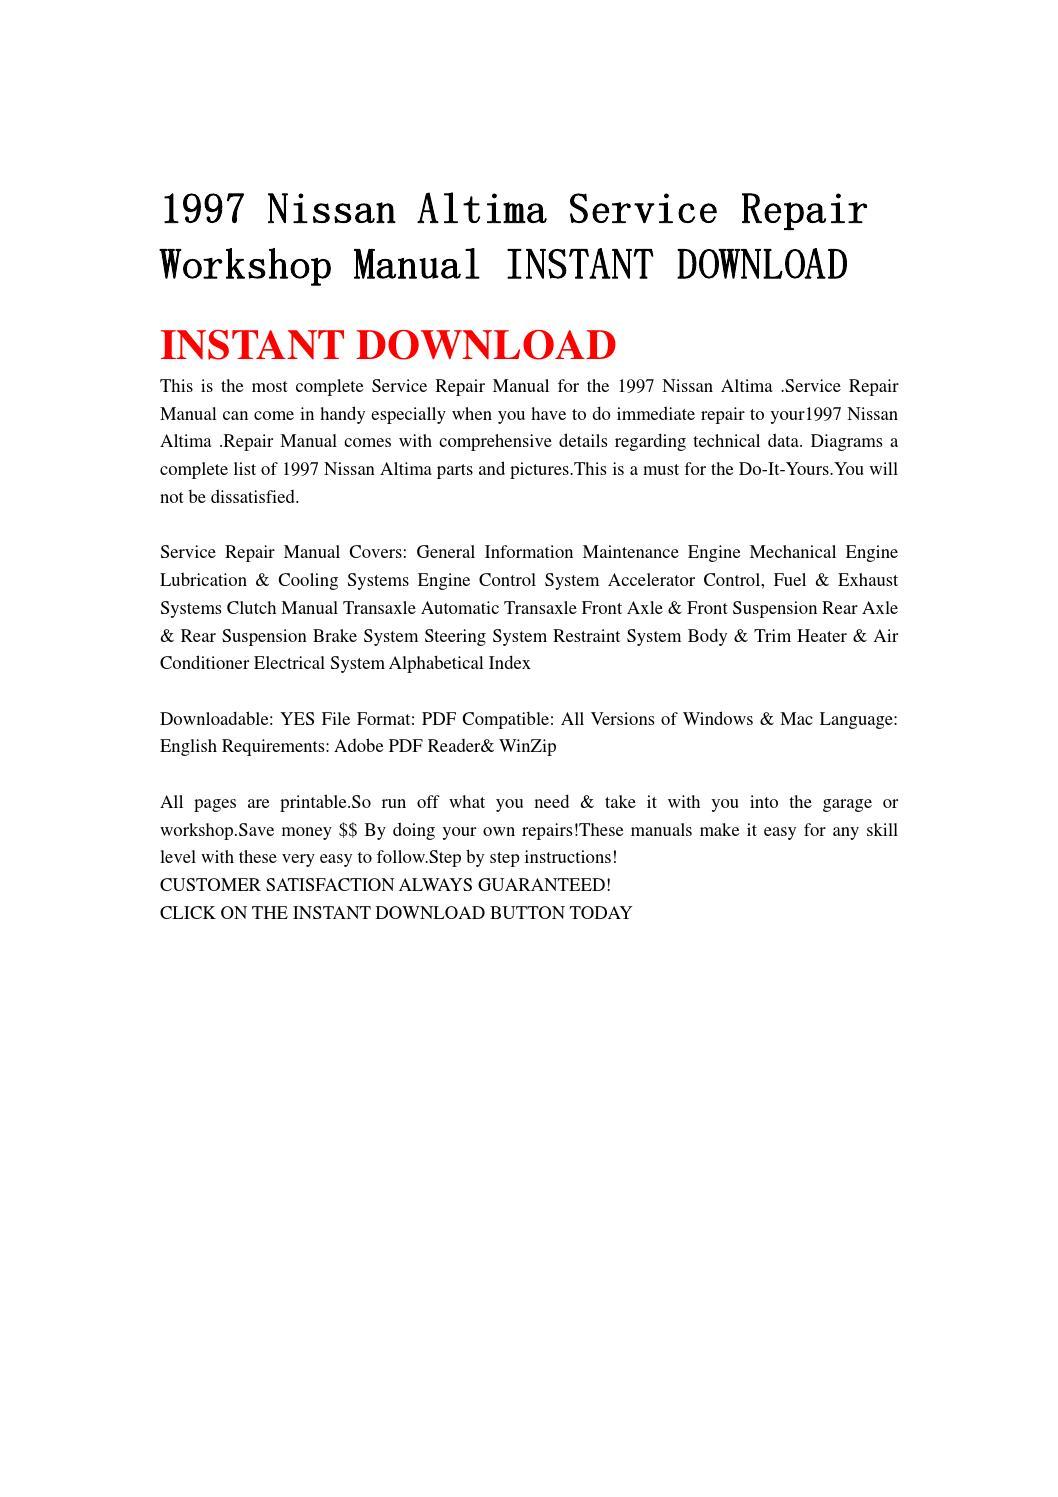 1997 nissan altima service repair workshop manual instant download rh issuu com 1997 Nissan Altima Custom 1997 Nissan Altima Wiring Diagram